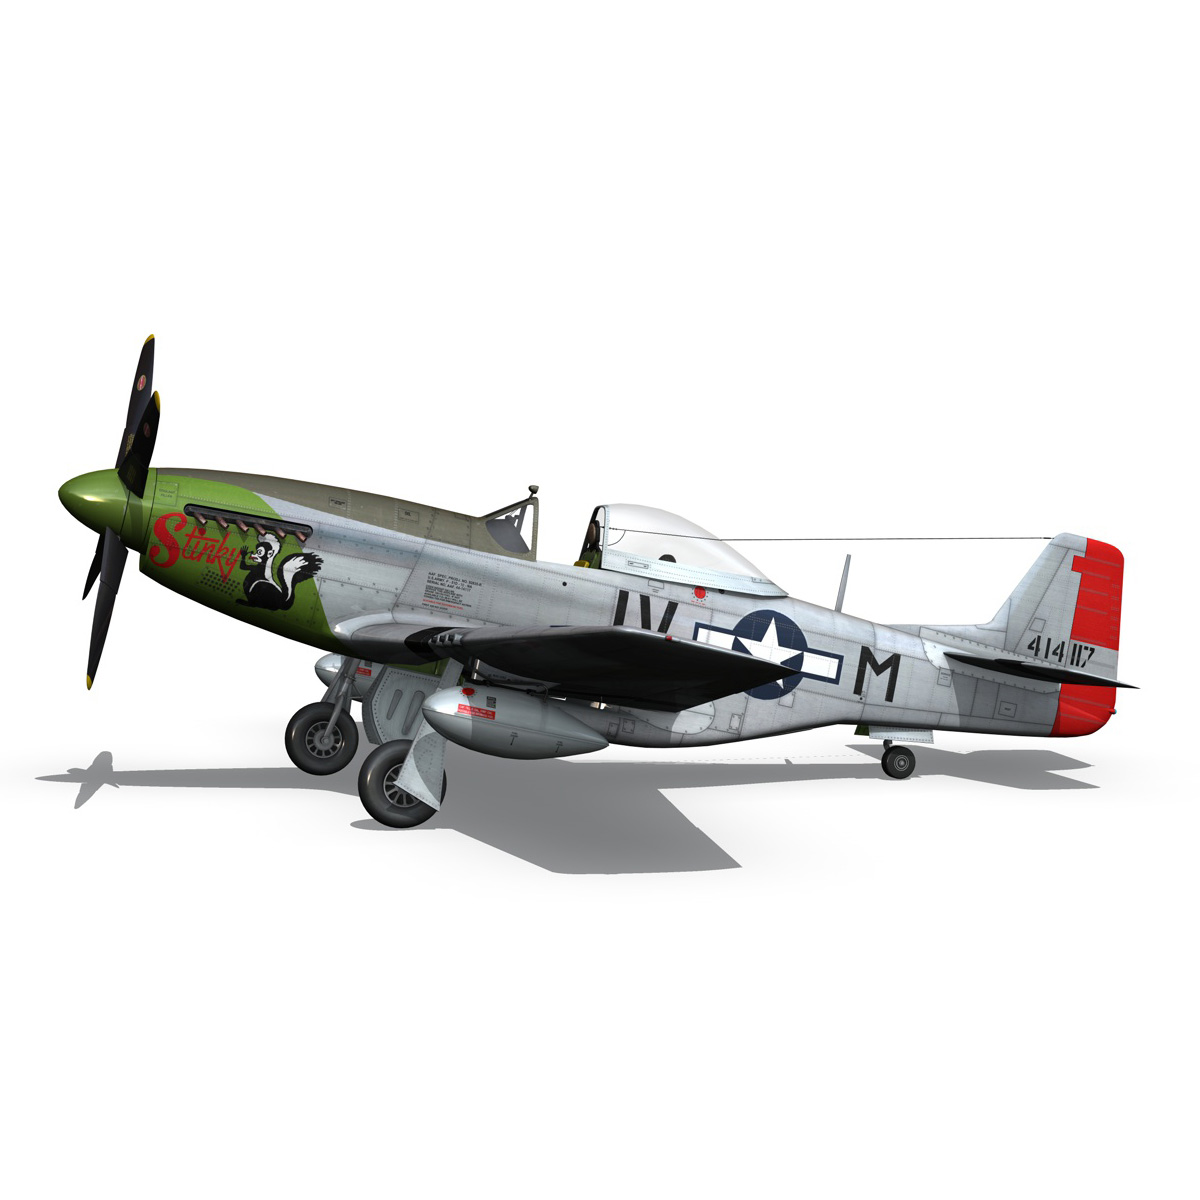 north american p-51d mustang – stinky 3d model fbx c4d lwo obj 269605